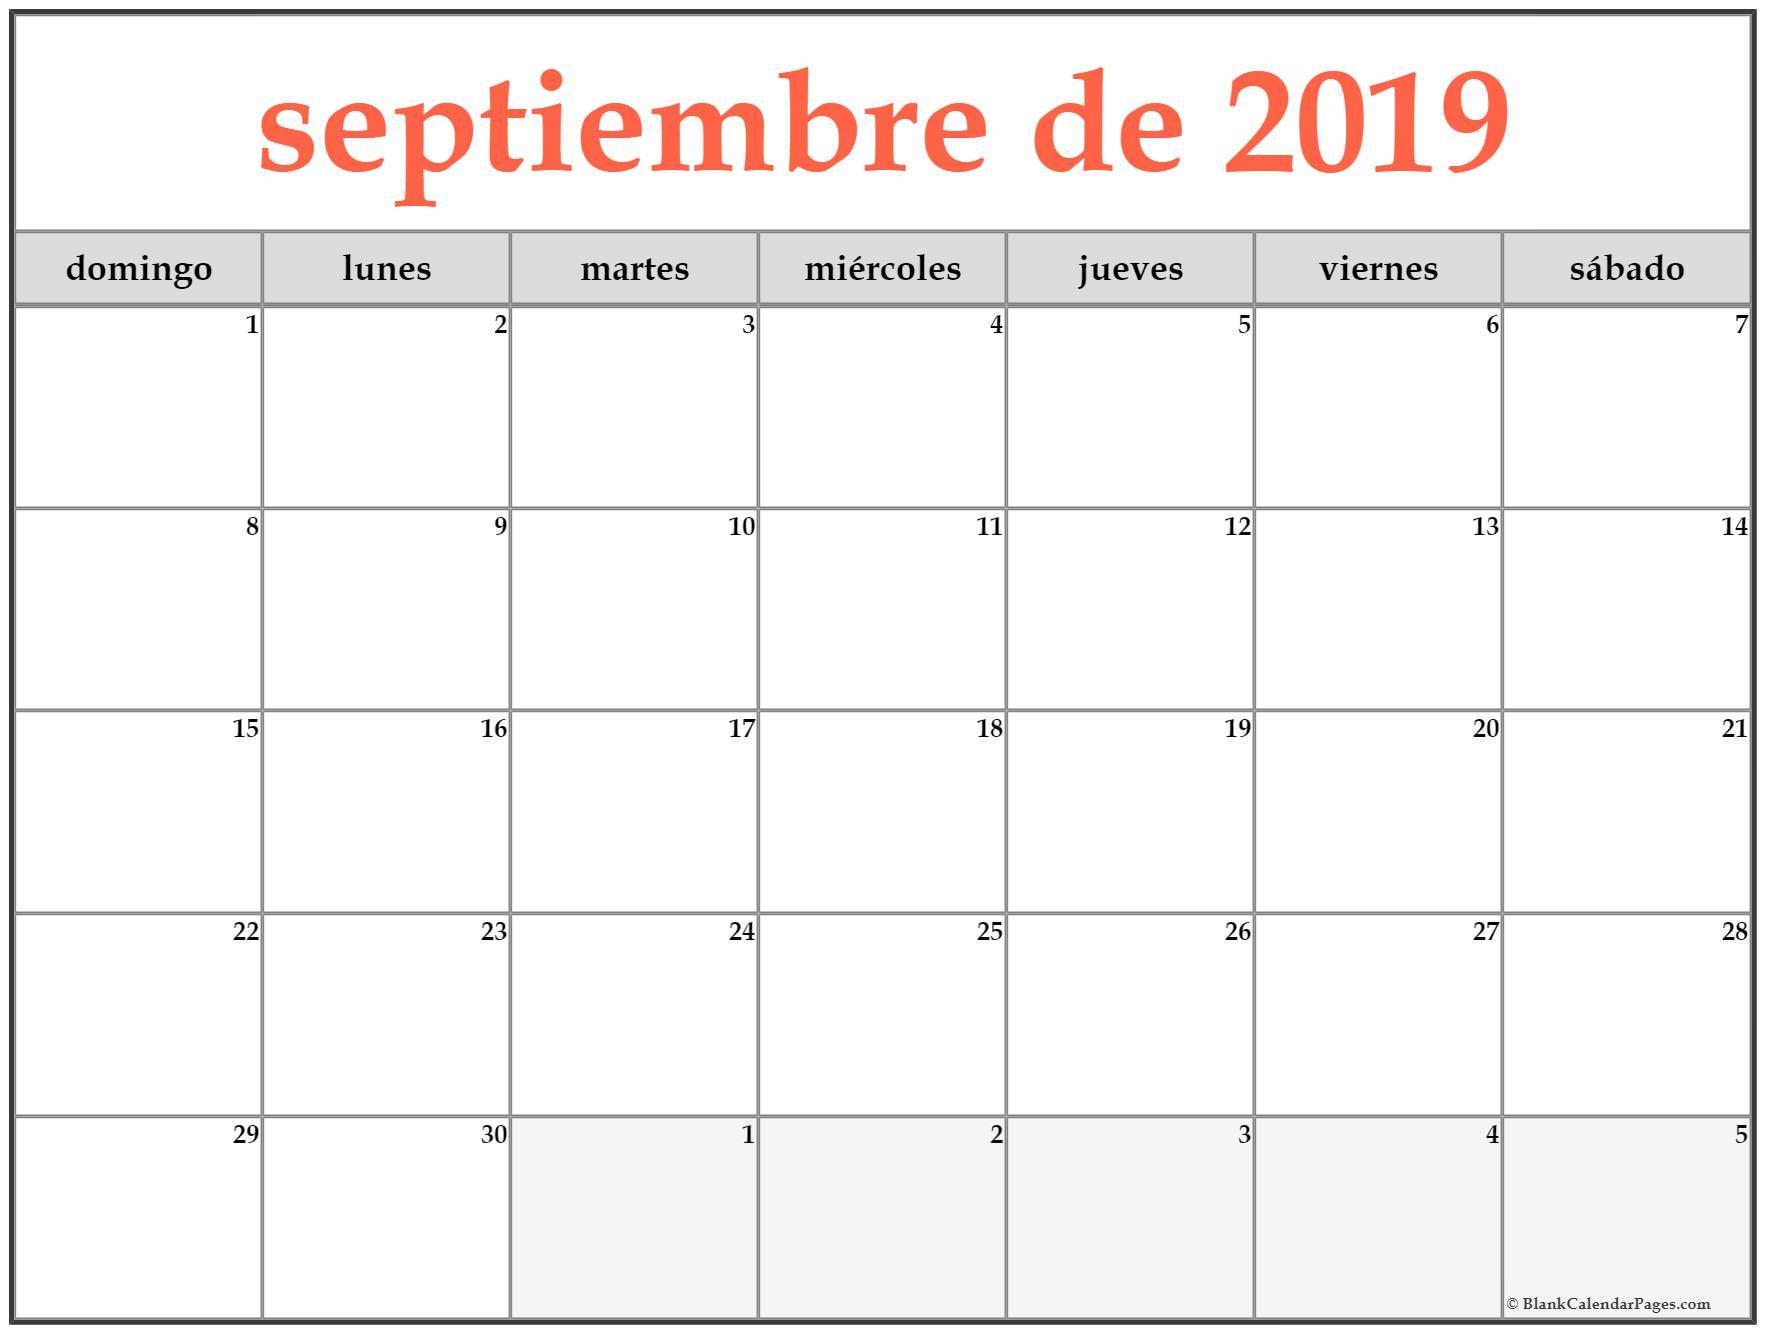 Calendario 2019 Chile Para Imprimir Más Arriba-a-fecha Best Calendario Septiembre 2015 Para Imprimir Image Collection Of Calendario 2019 Chile Para Imprimir Recientes Calendario 8 Agosto ☼ Calendario Pinterest